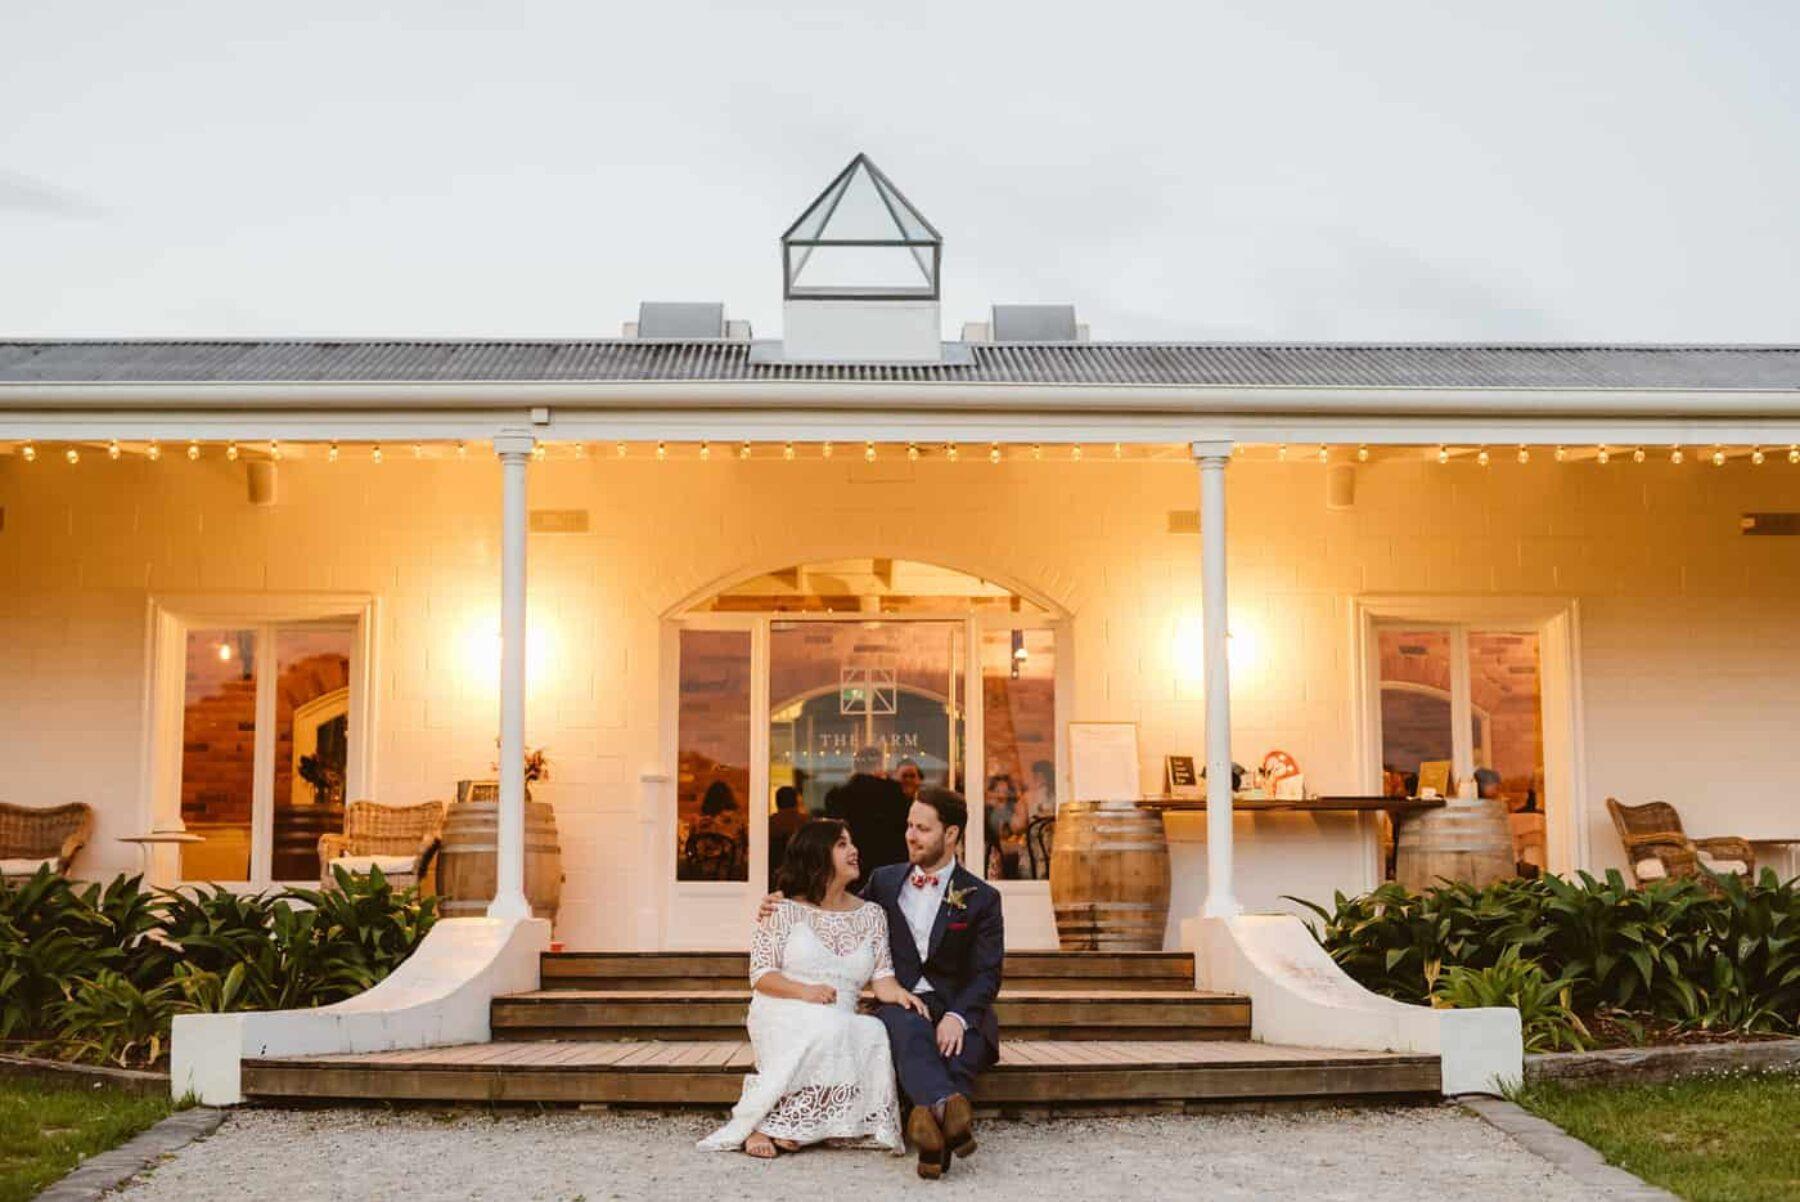 Rustic wedding at The Farm Yarra Valley - photography by Motta Weddings